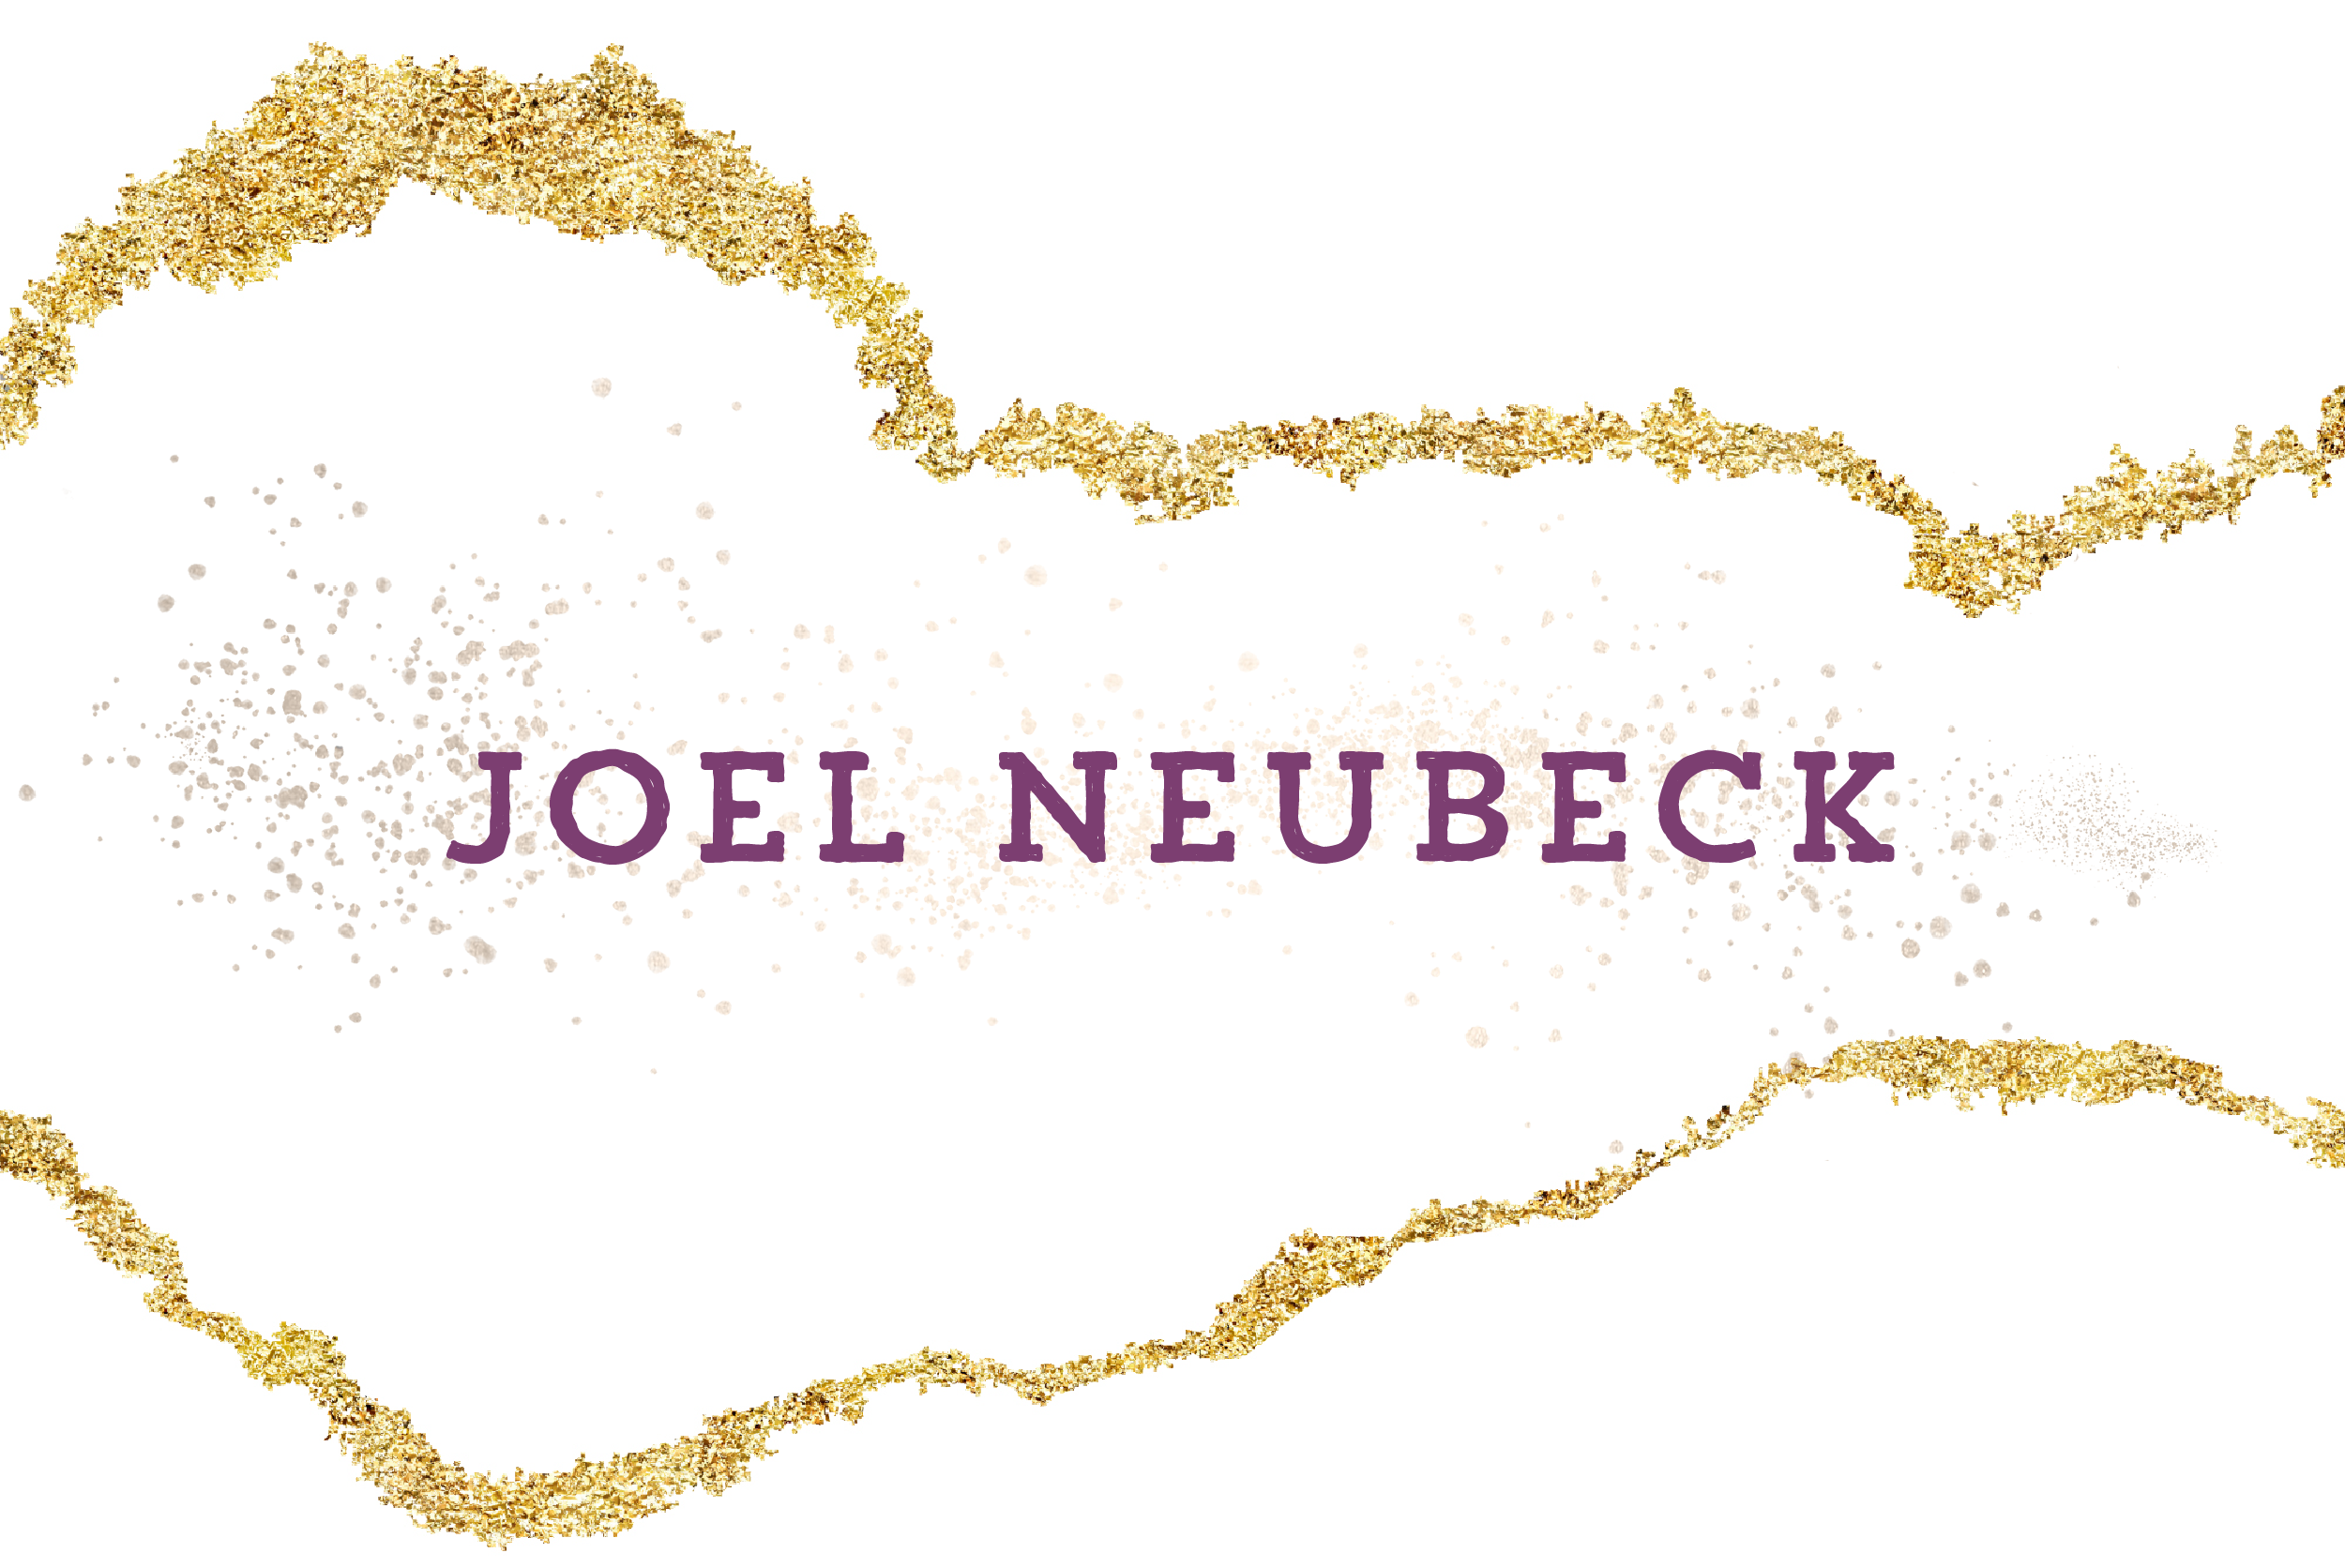 Joel Neubeck name logo